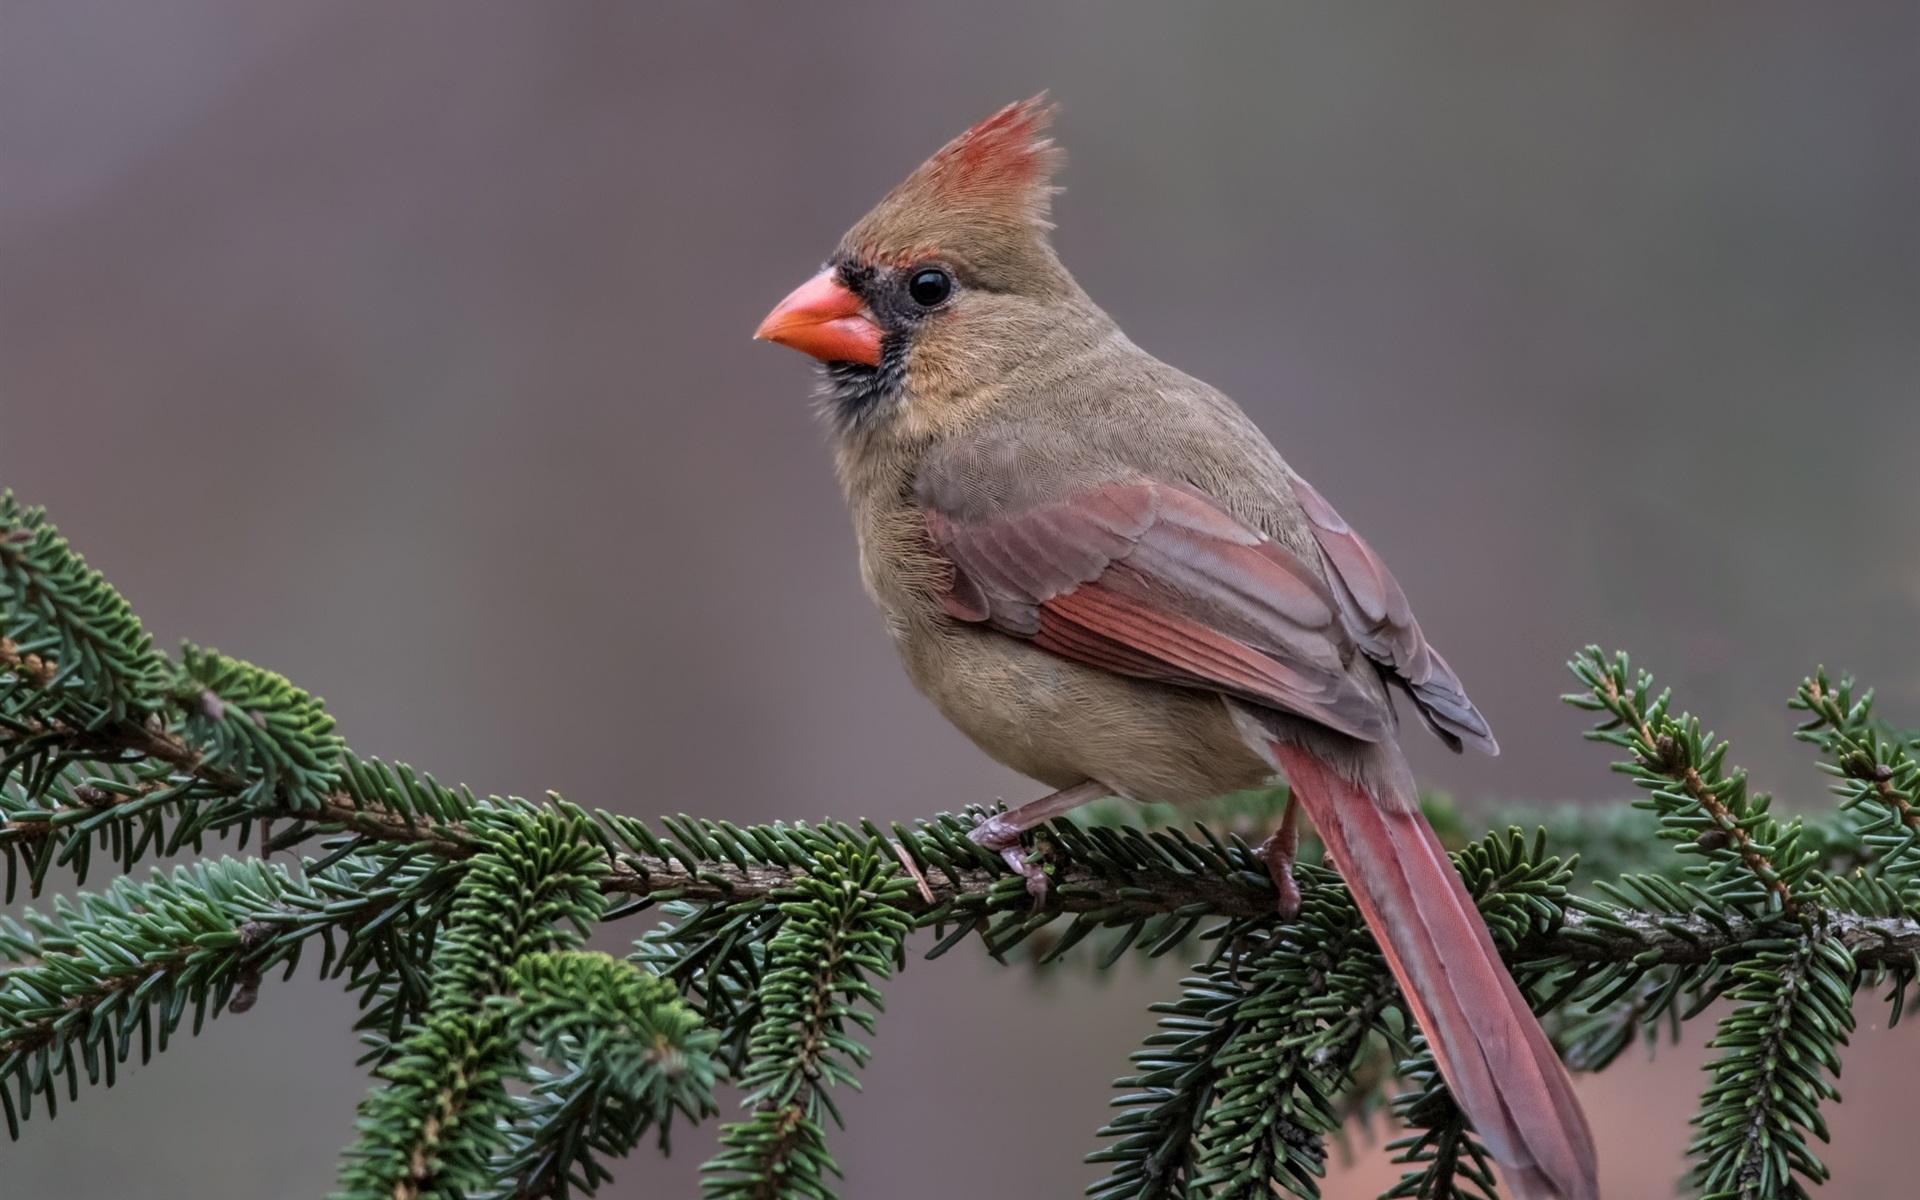 Wallpaper Red Cardinal Bird, Pine Twigs 1920x1200 HD